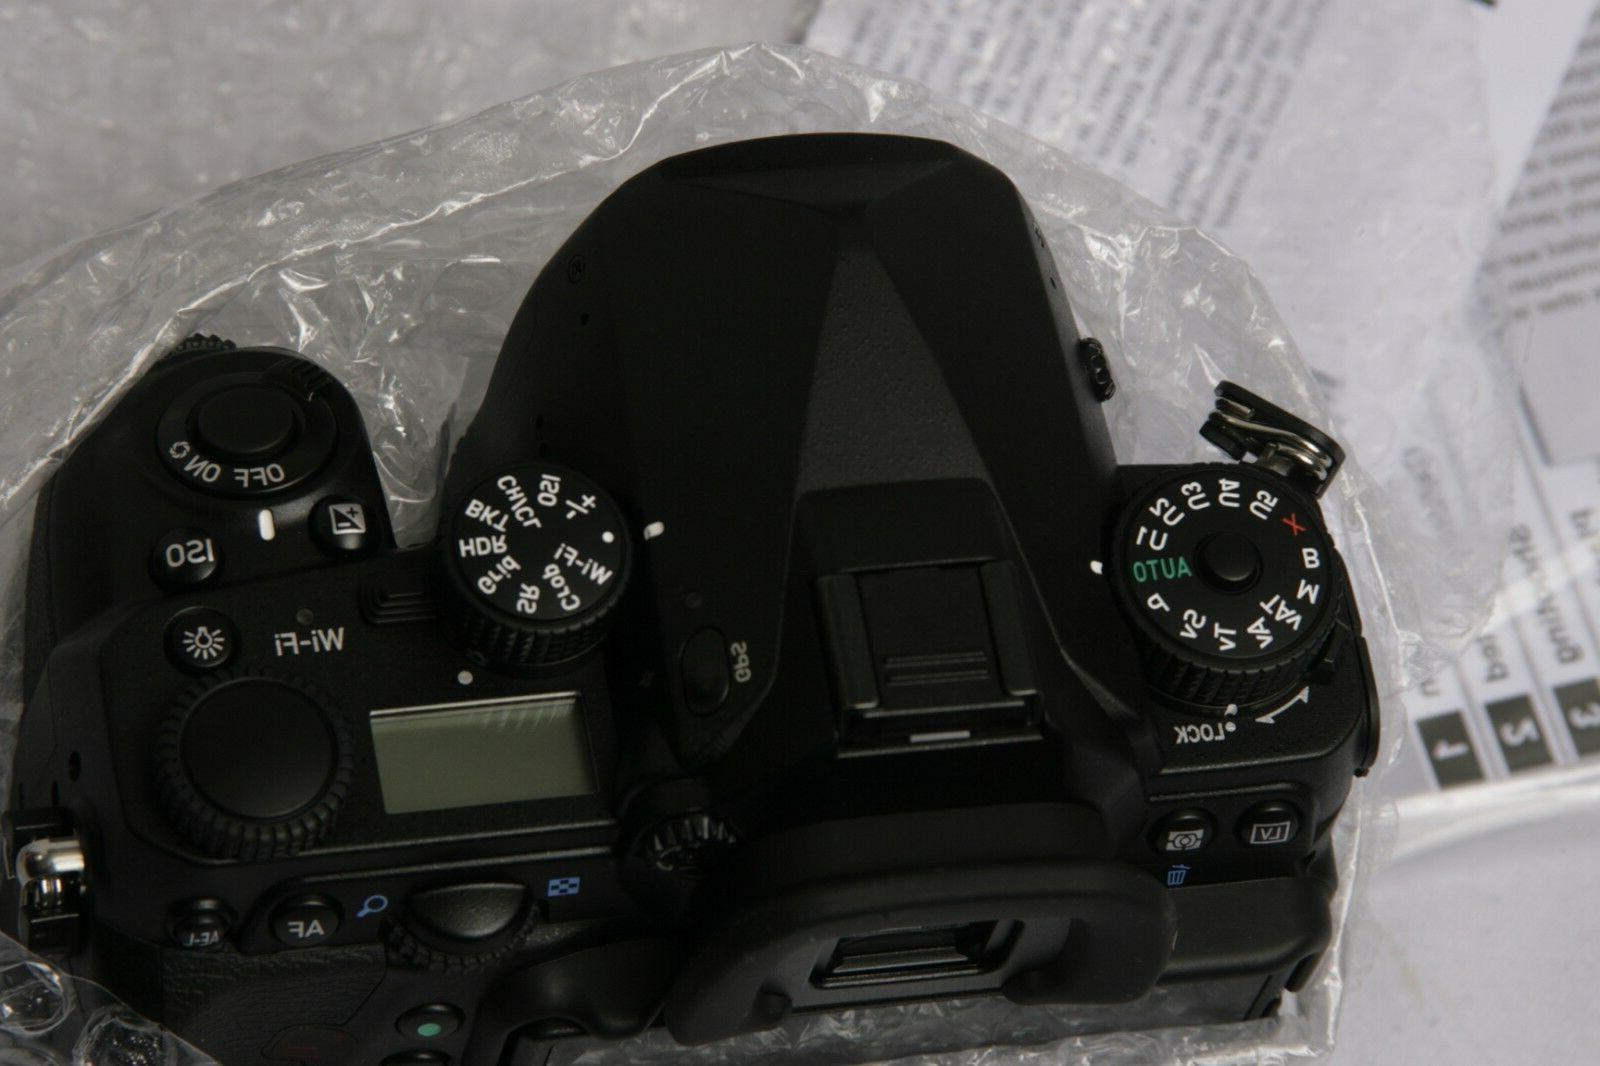 PENTAX K-1 II 36.4 Digital -